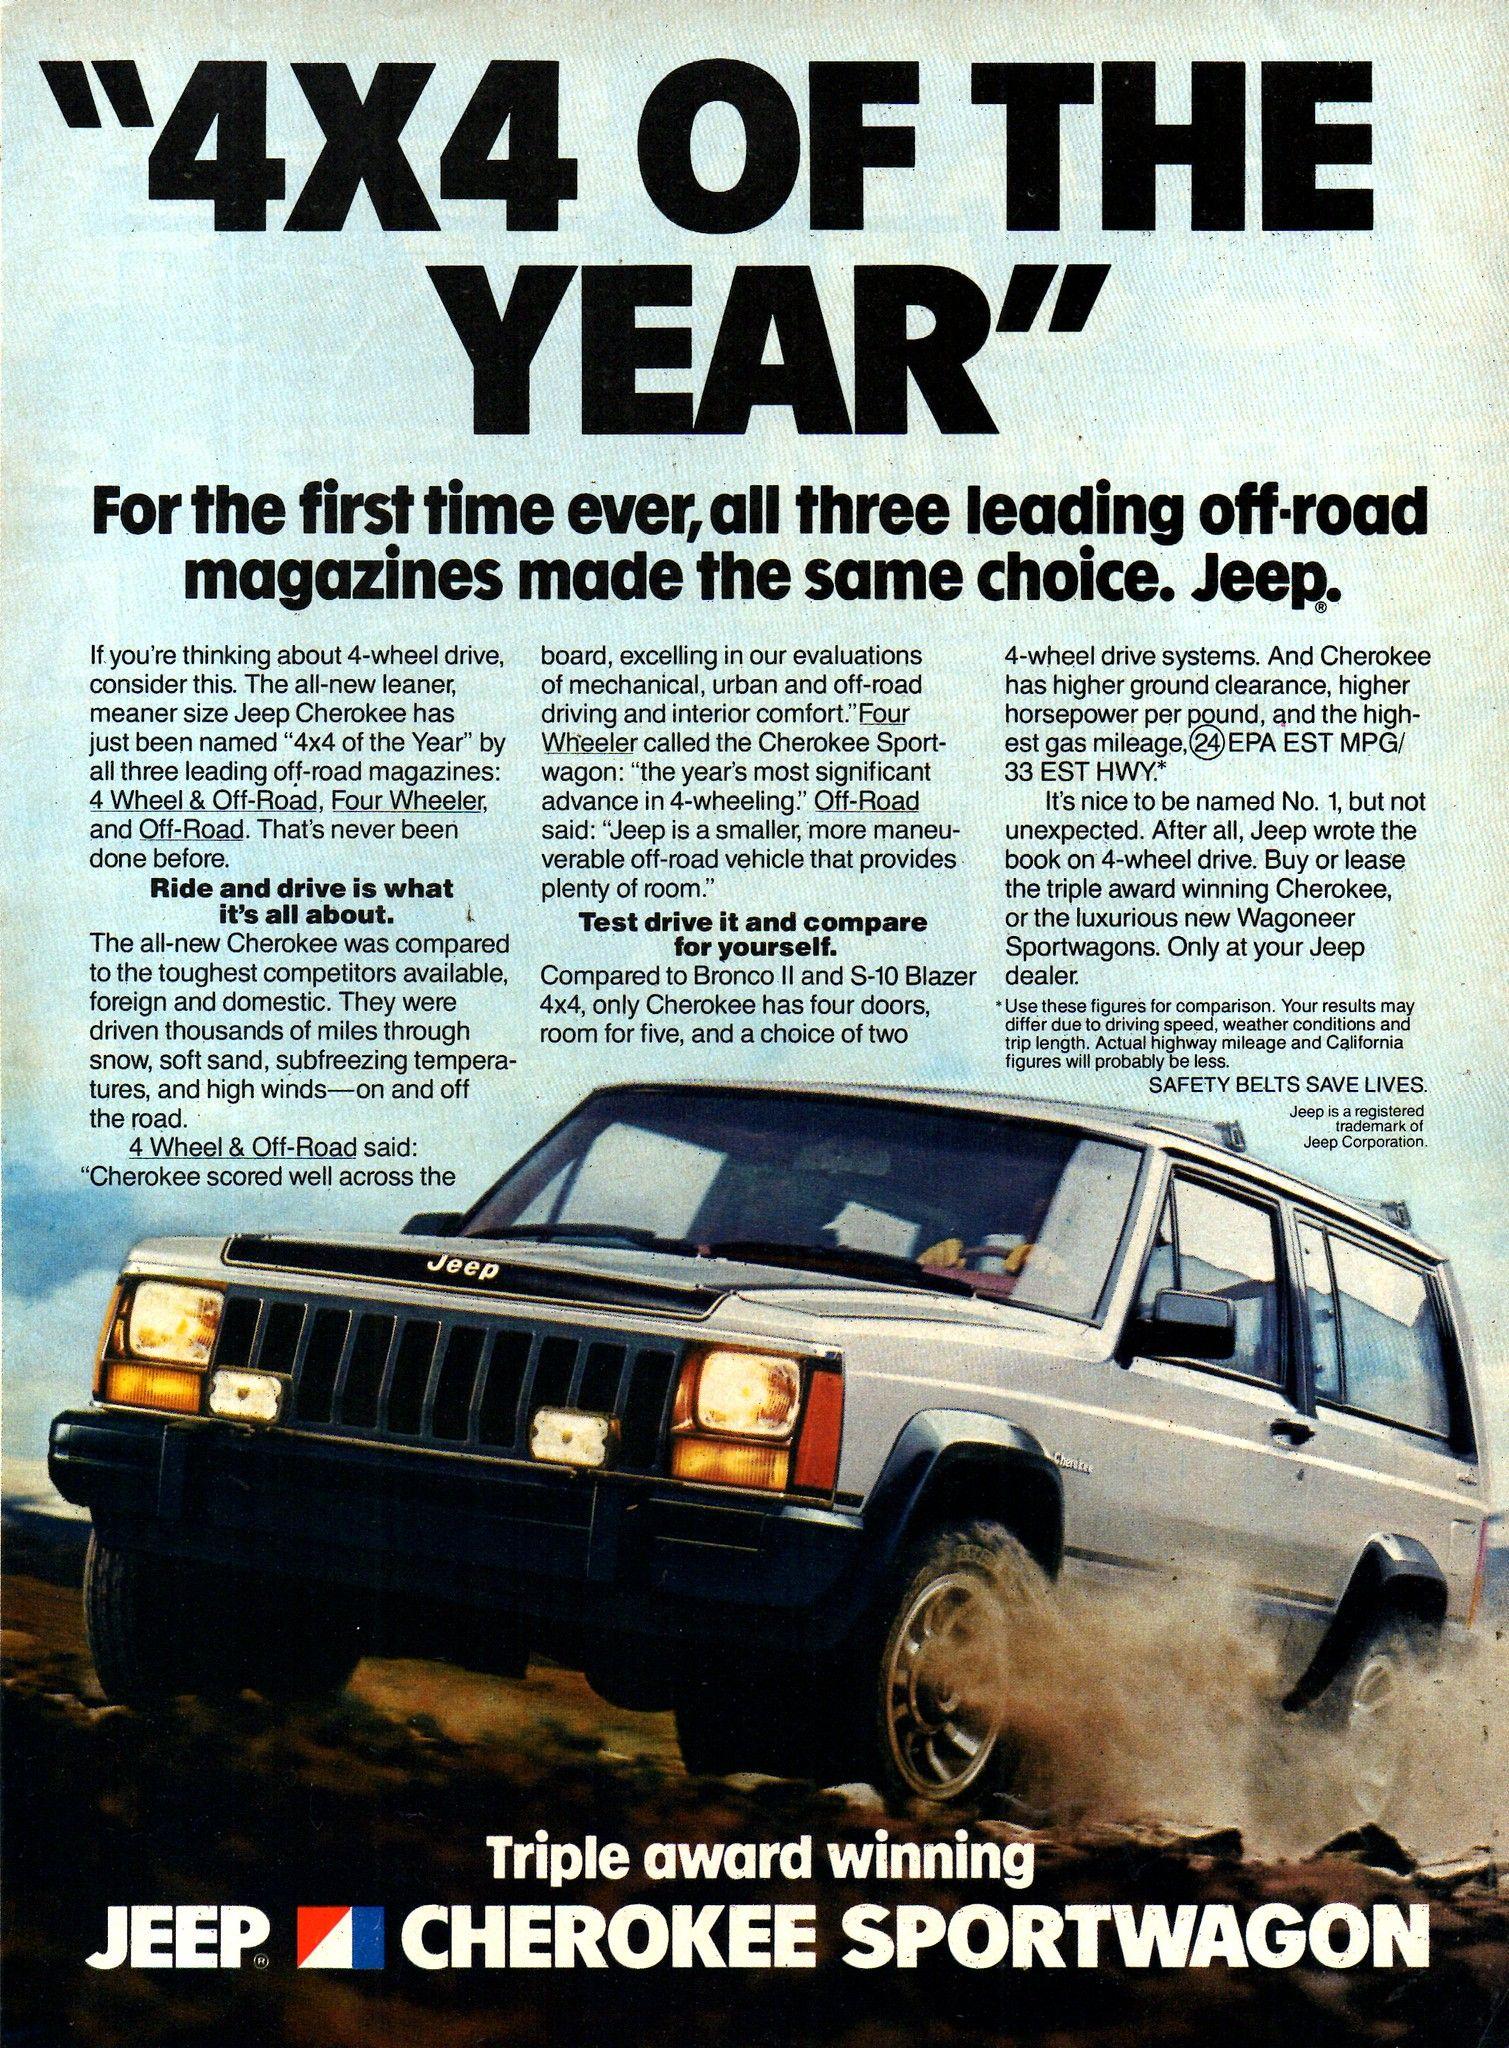 1984 Jeep Cherokee Sportwagon 4wd Wagon American Motors Usa